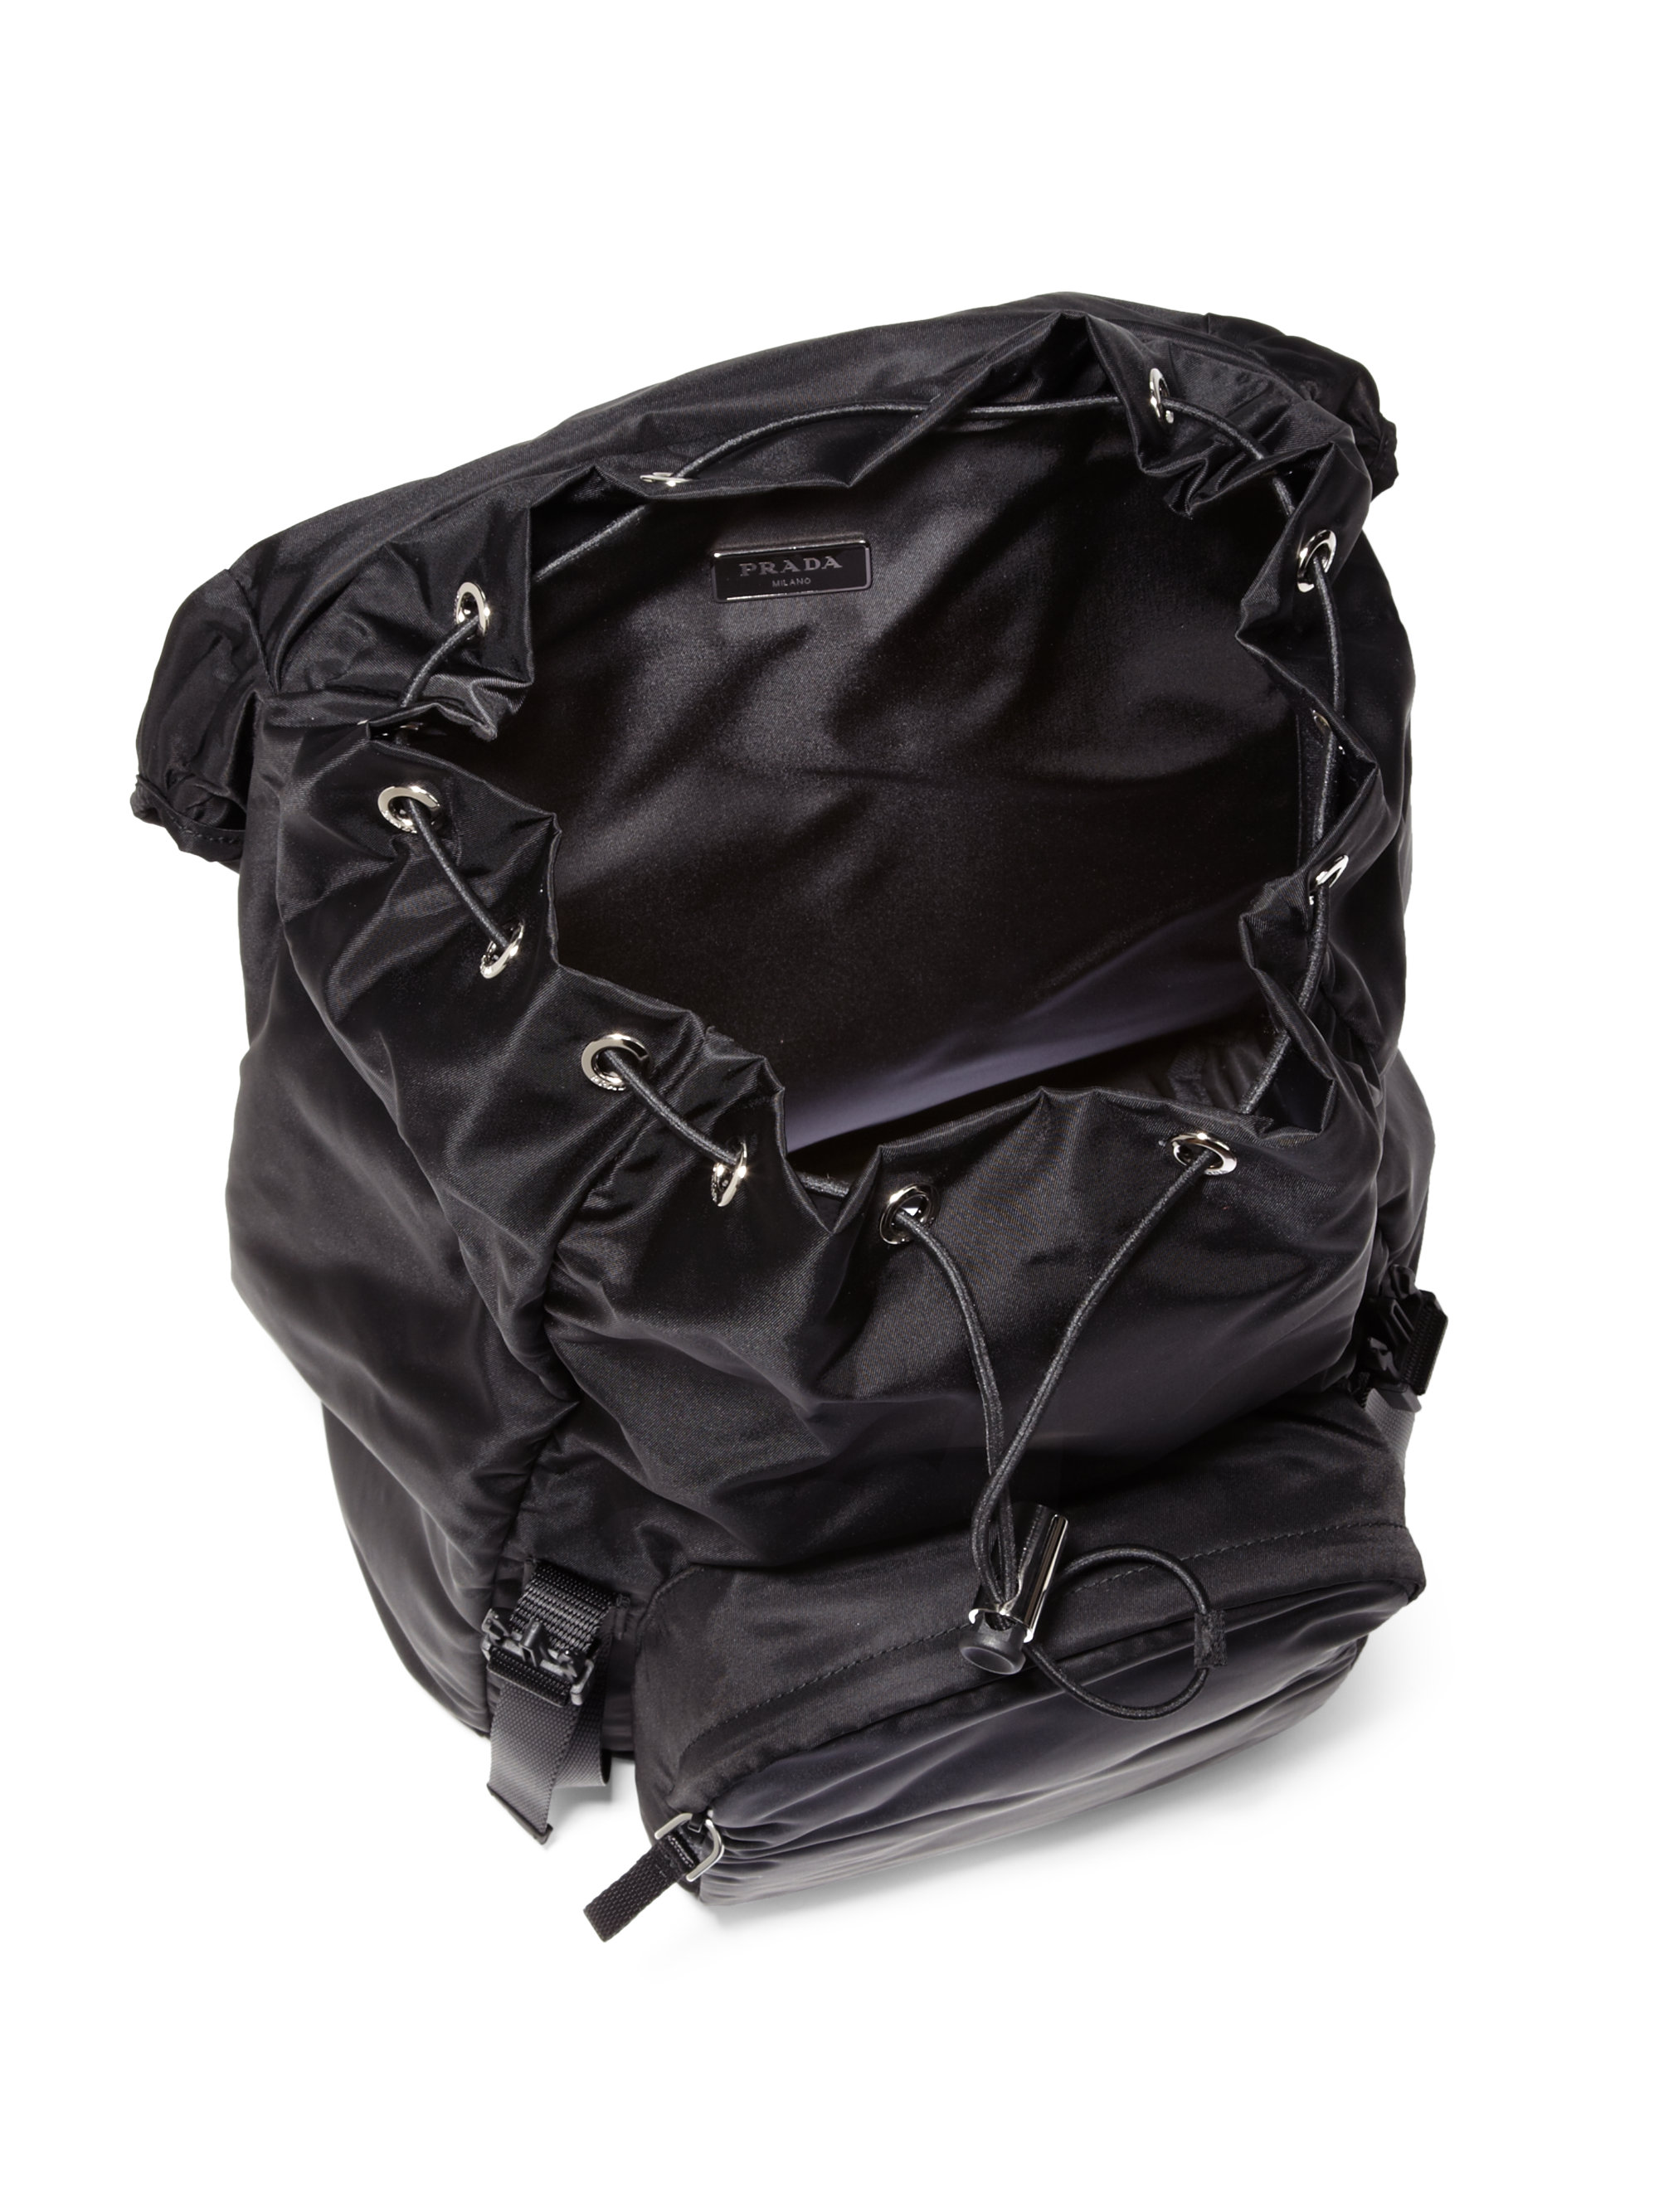 8db51de8c377 ... closeout lyst prada nylon backpack in black for men 21c27 091b6